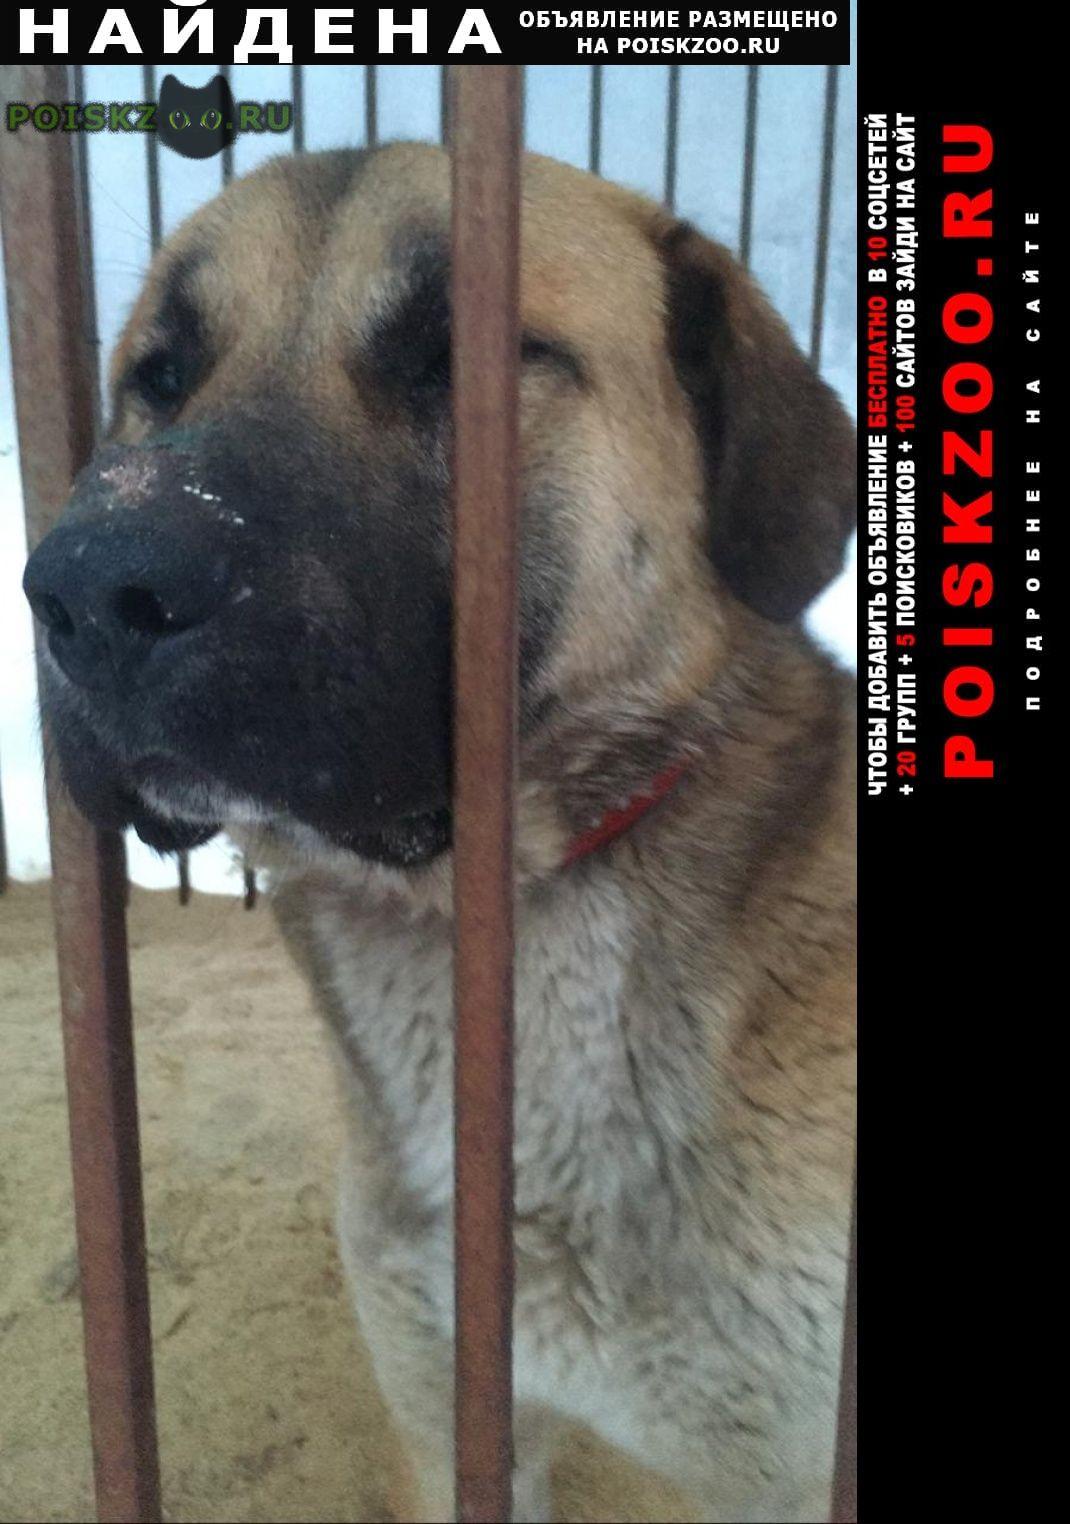 Найдена собака кобель анатолийская овчарка (метис) Пушкино